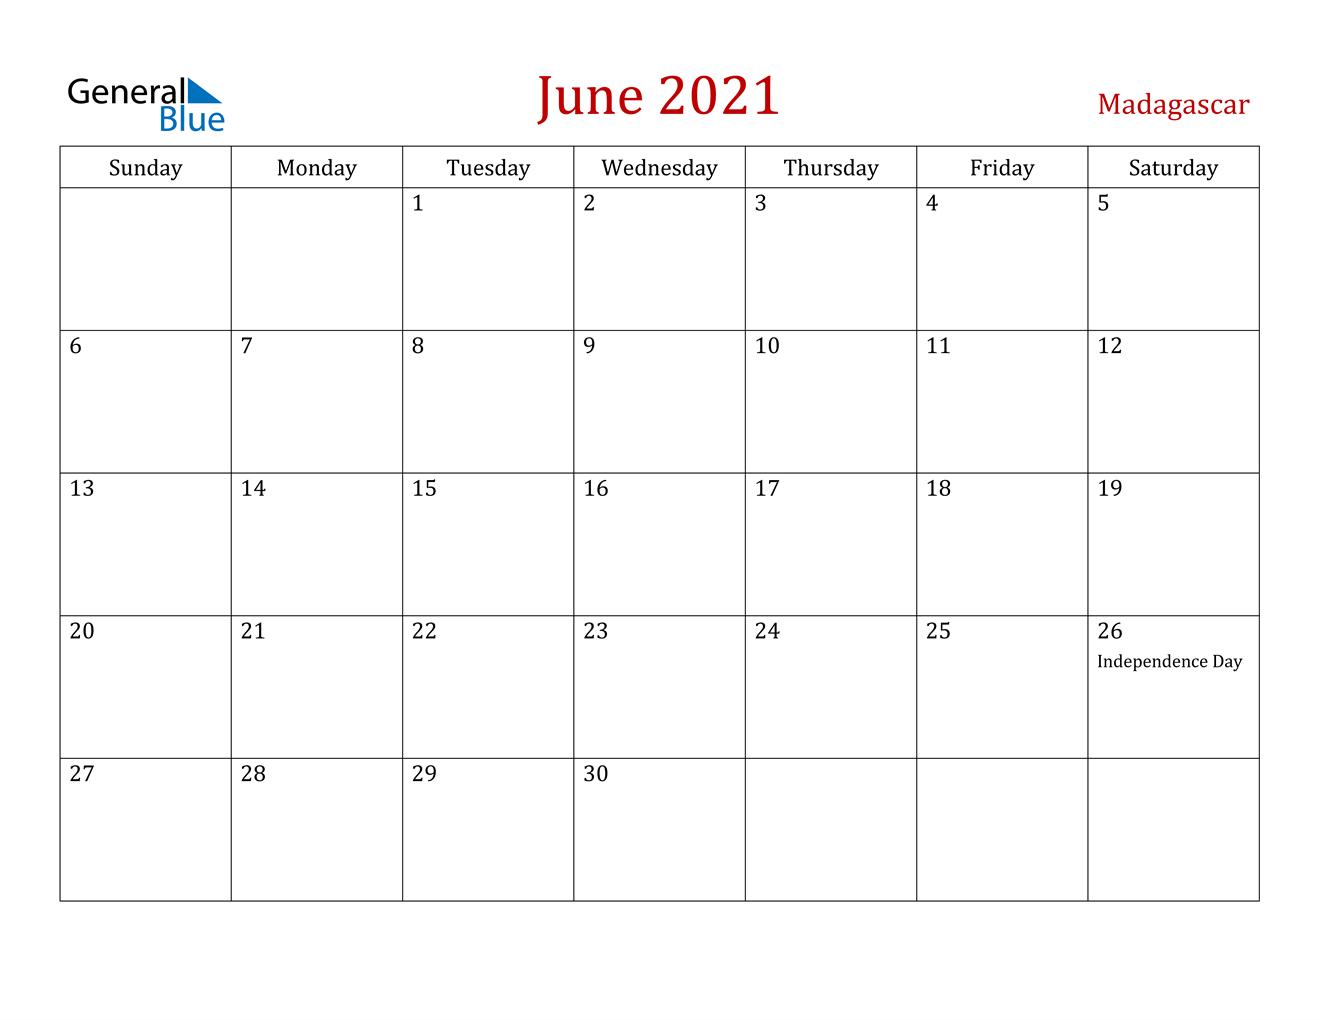 June 2021 Calendar - Madagascar  June 2021-June 2021 Calendar